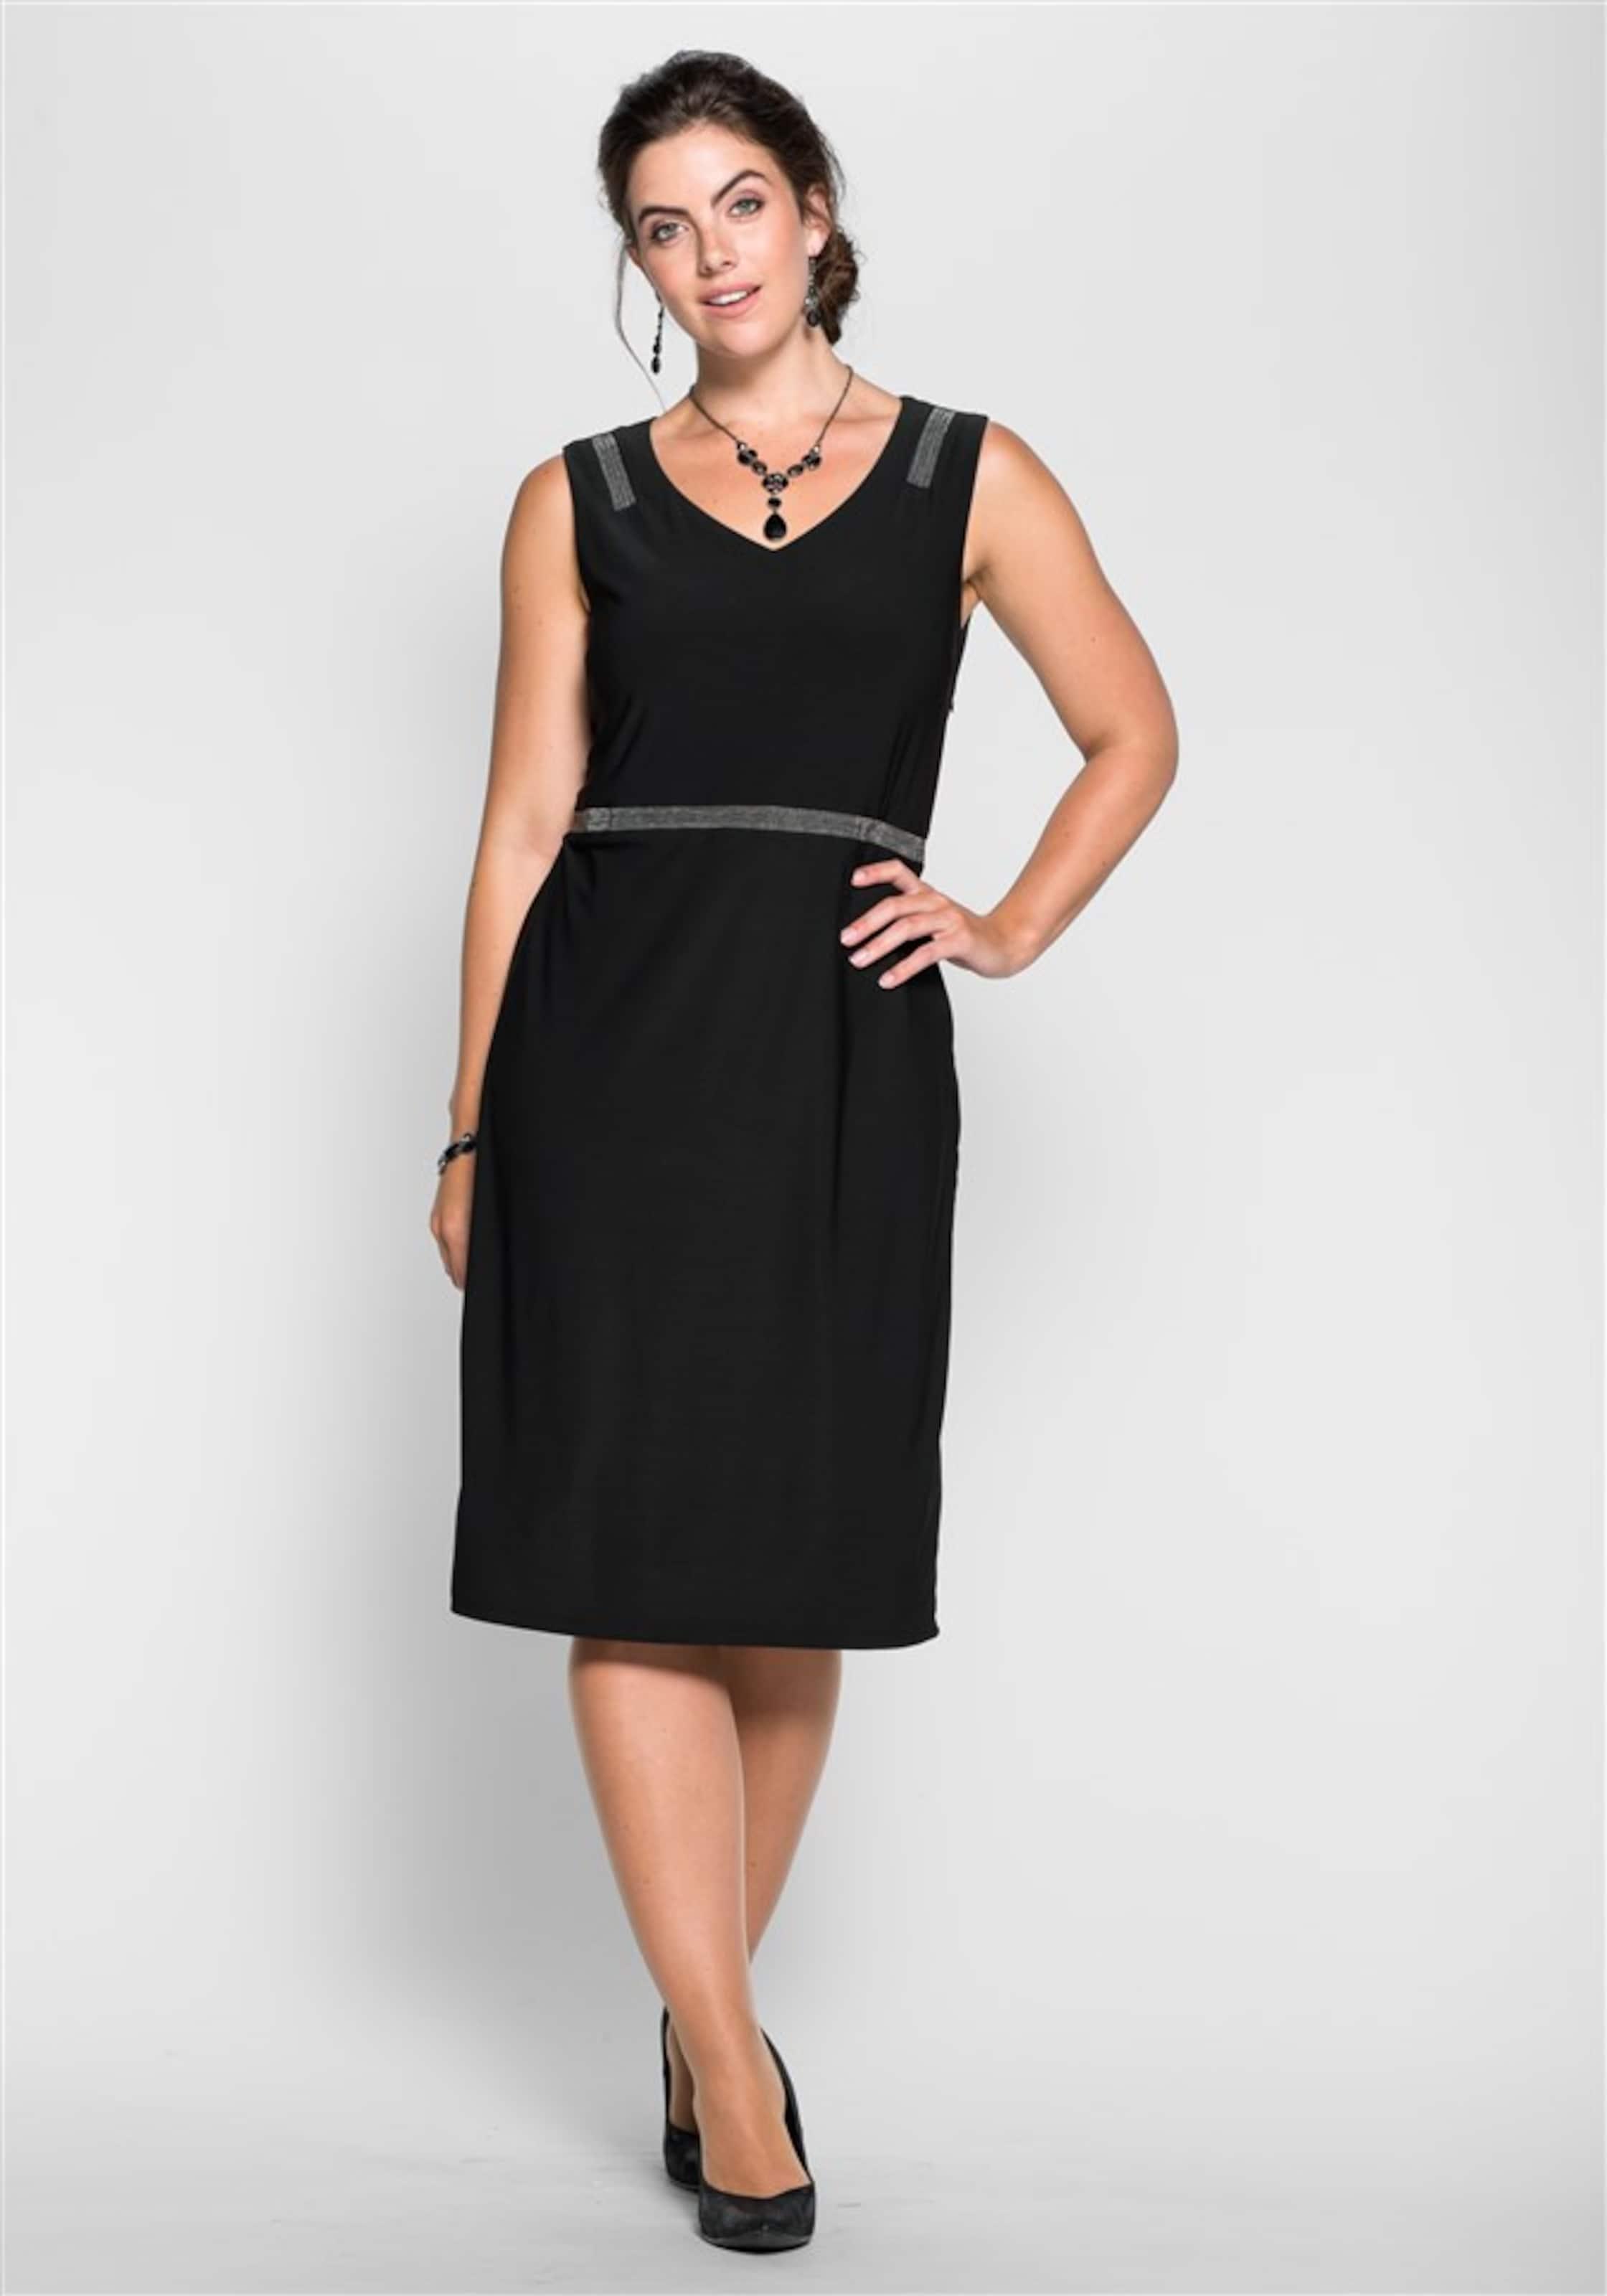 In Sheego Style In Kleid Sheego Style Kleid Schwarz In Schwarz Style Sheego Kleid eE29IDWHYb